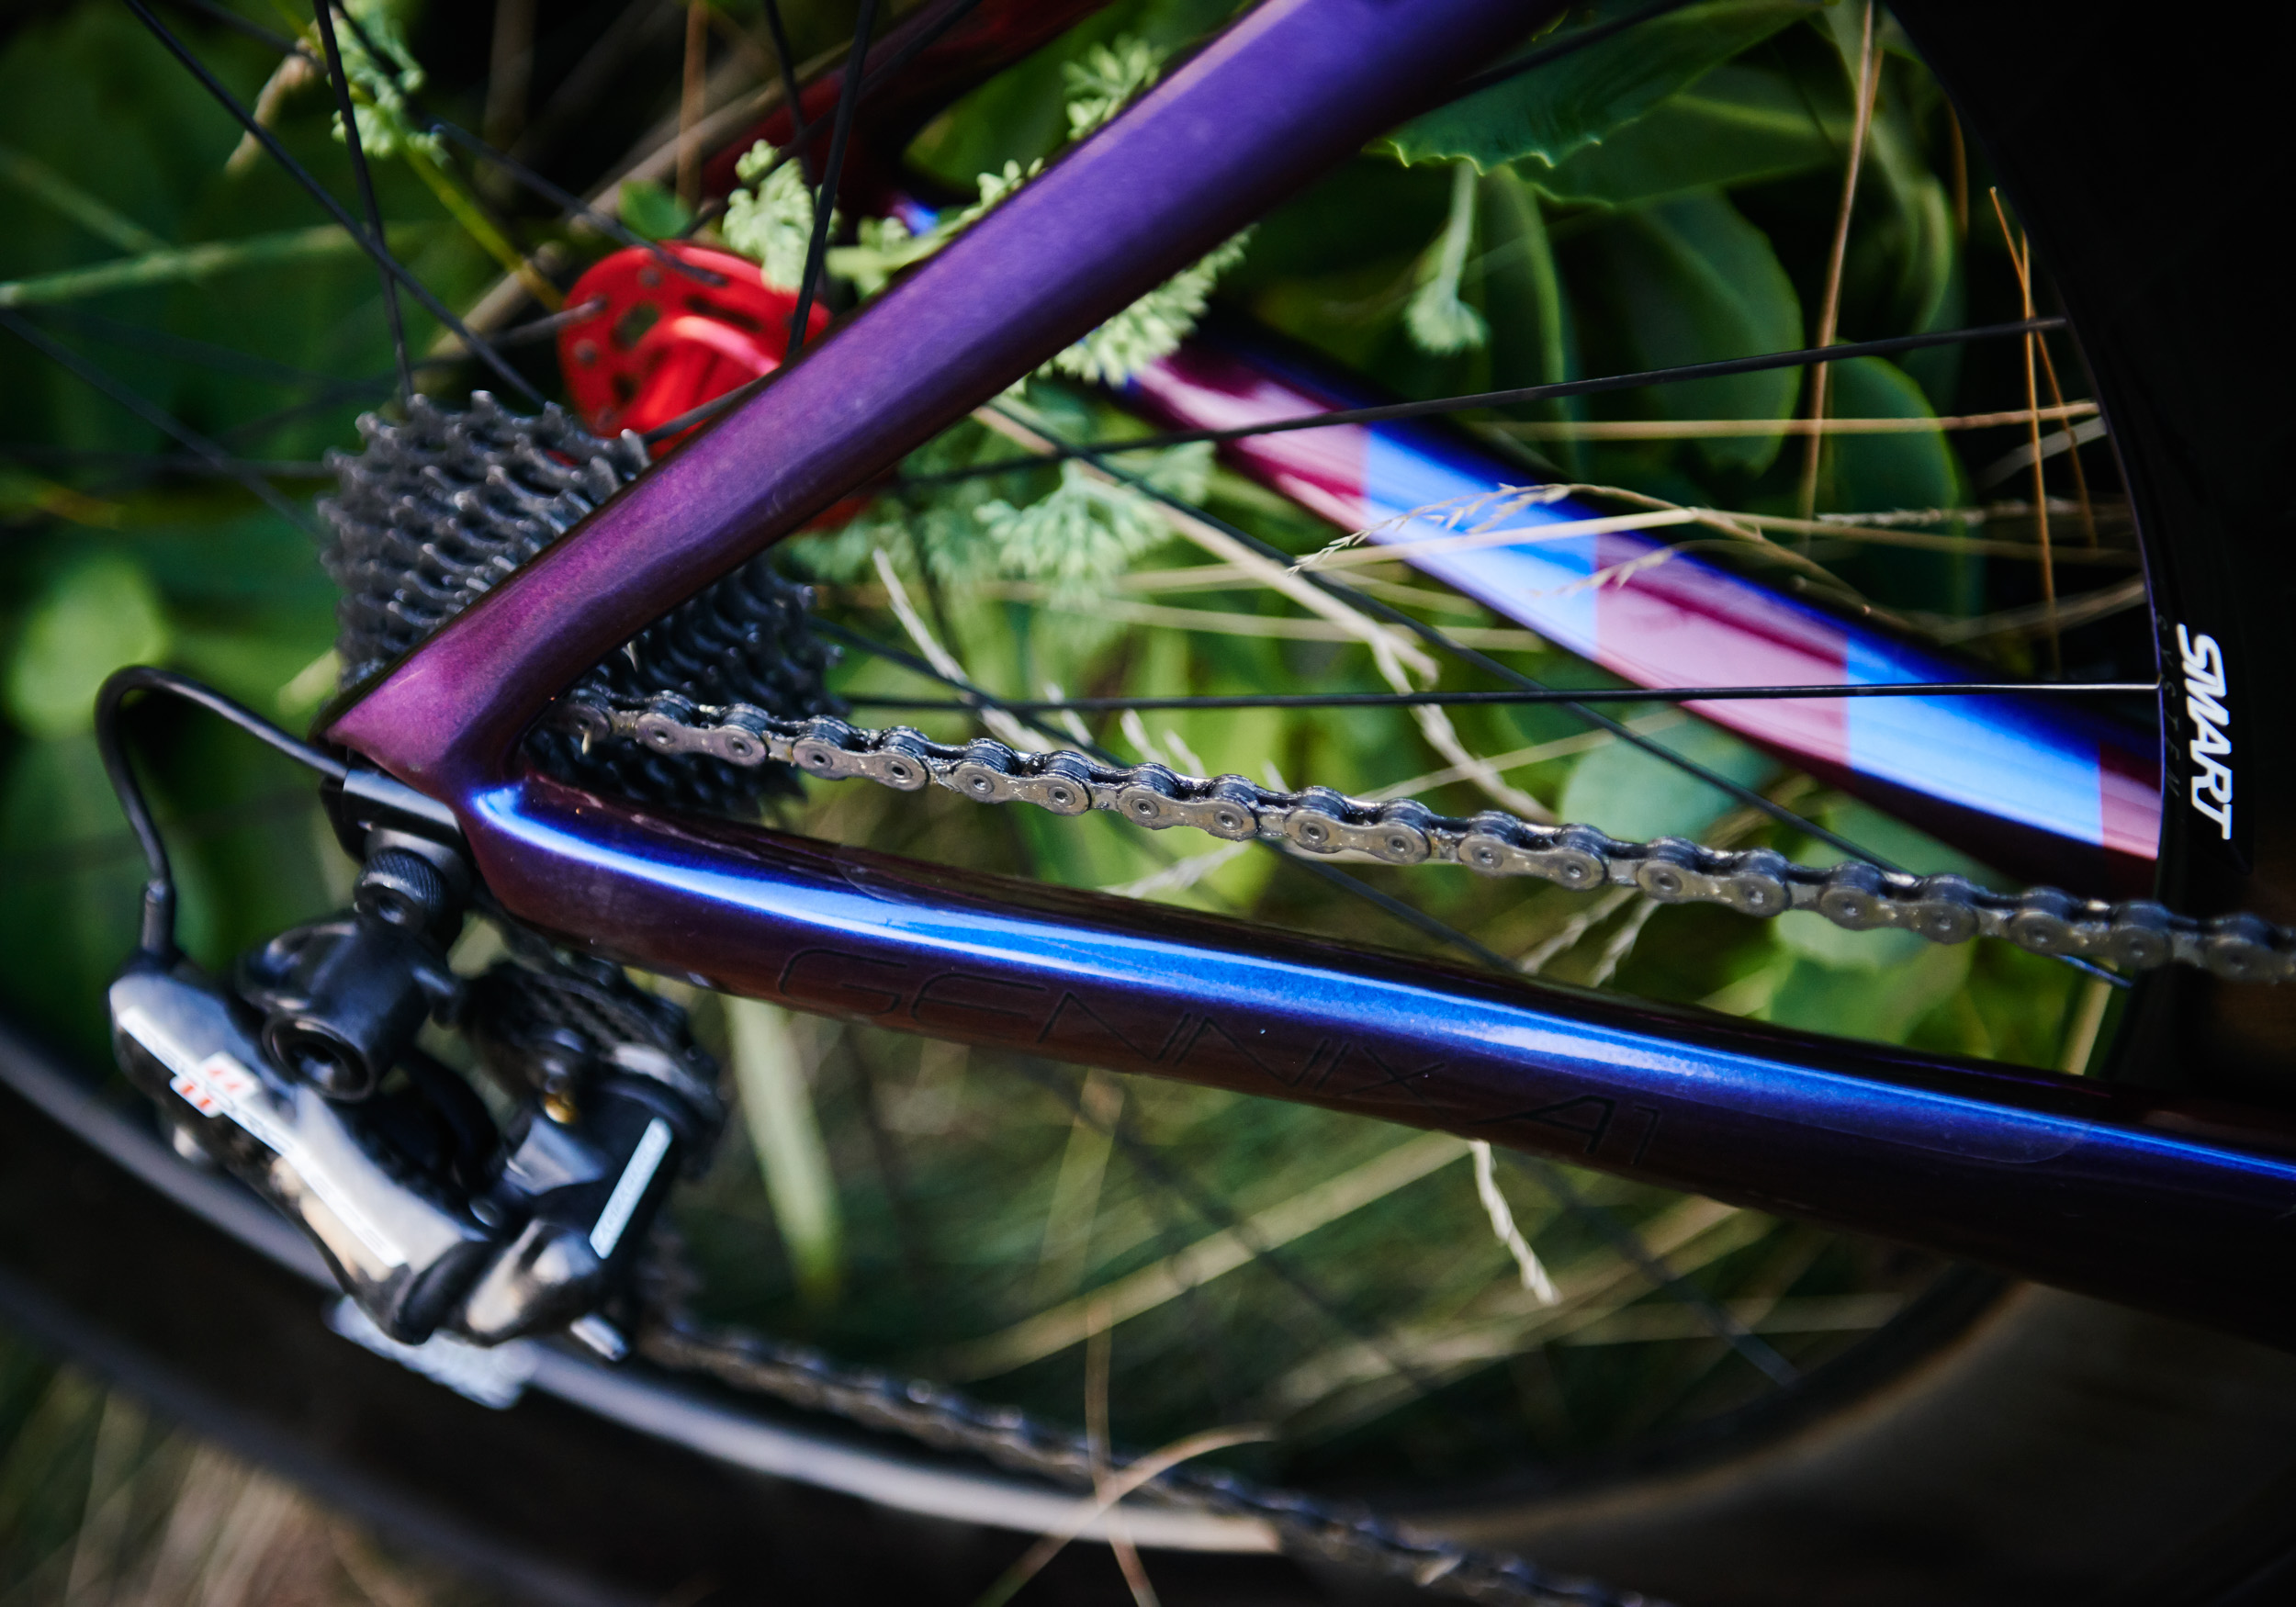 to-be-determined-garneau-a1-bike-review-116.jpg